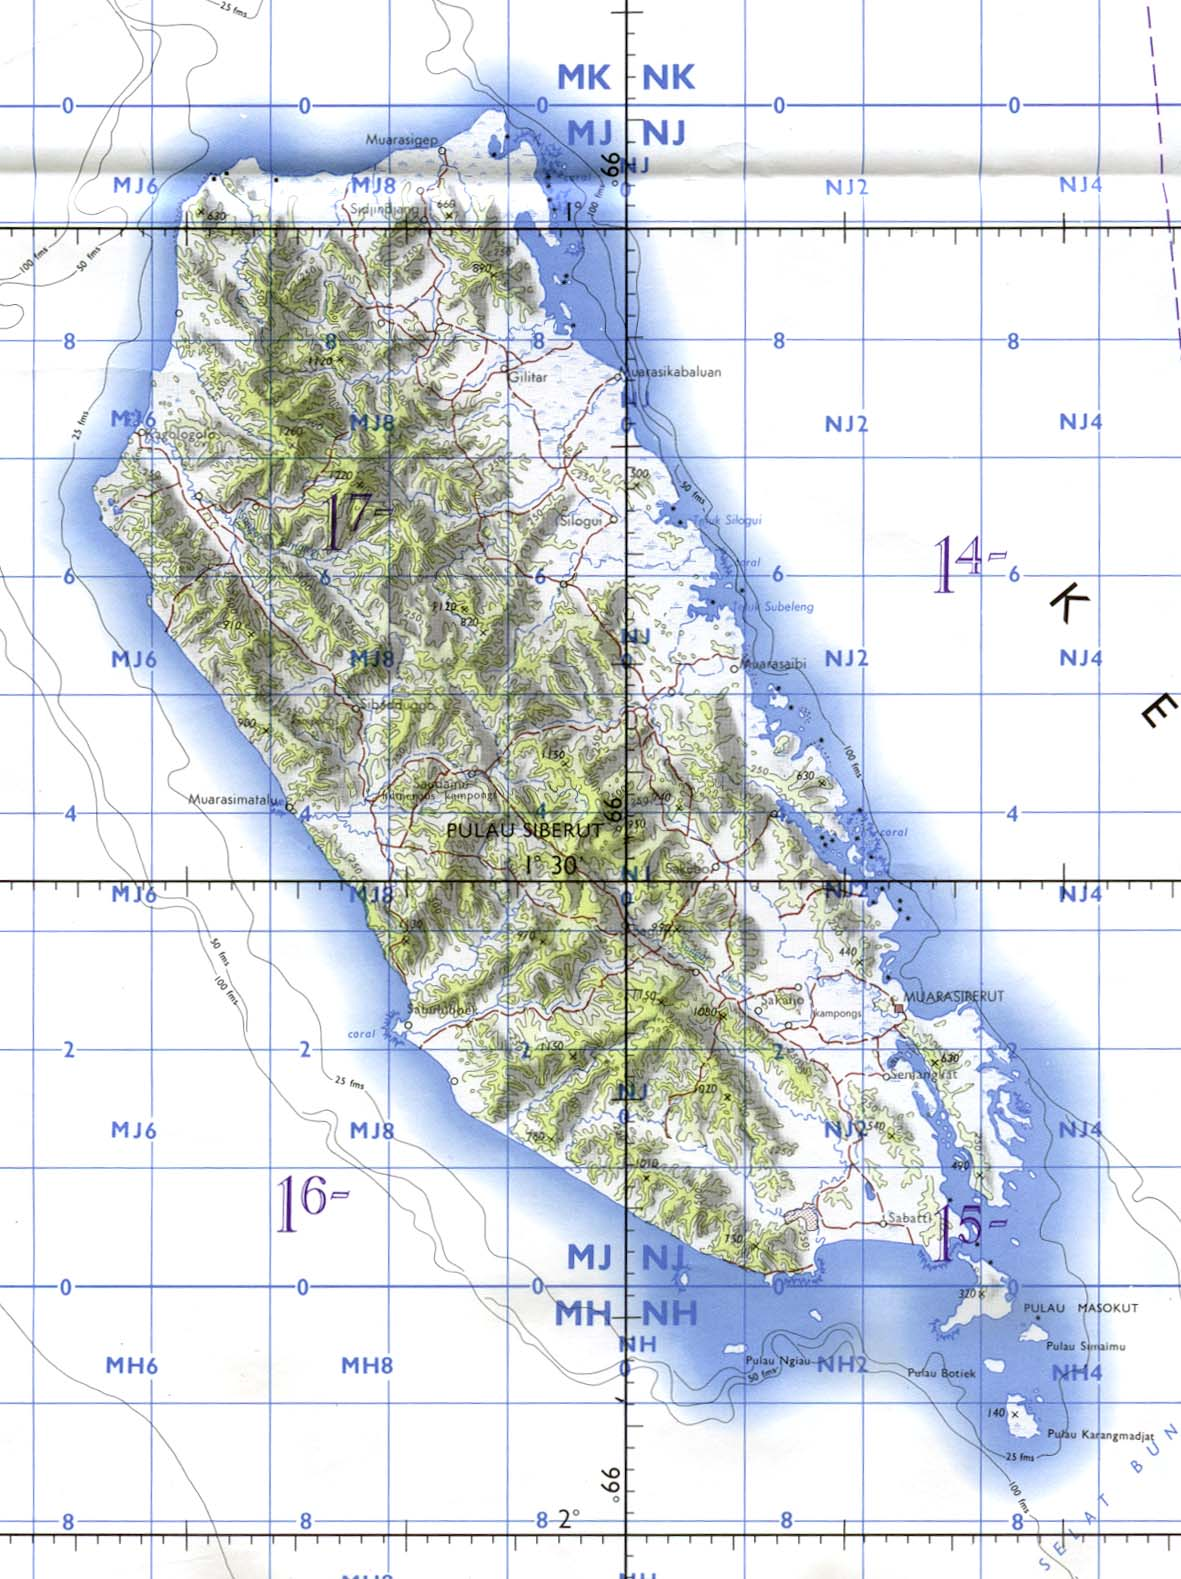 Siberut Island Tactical Pilotage Chart, Indonesia